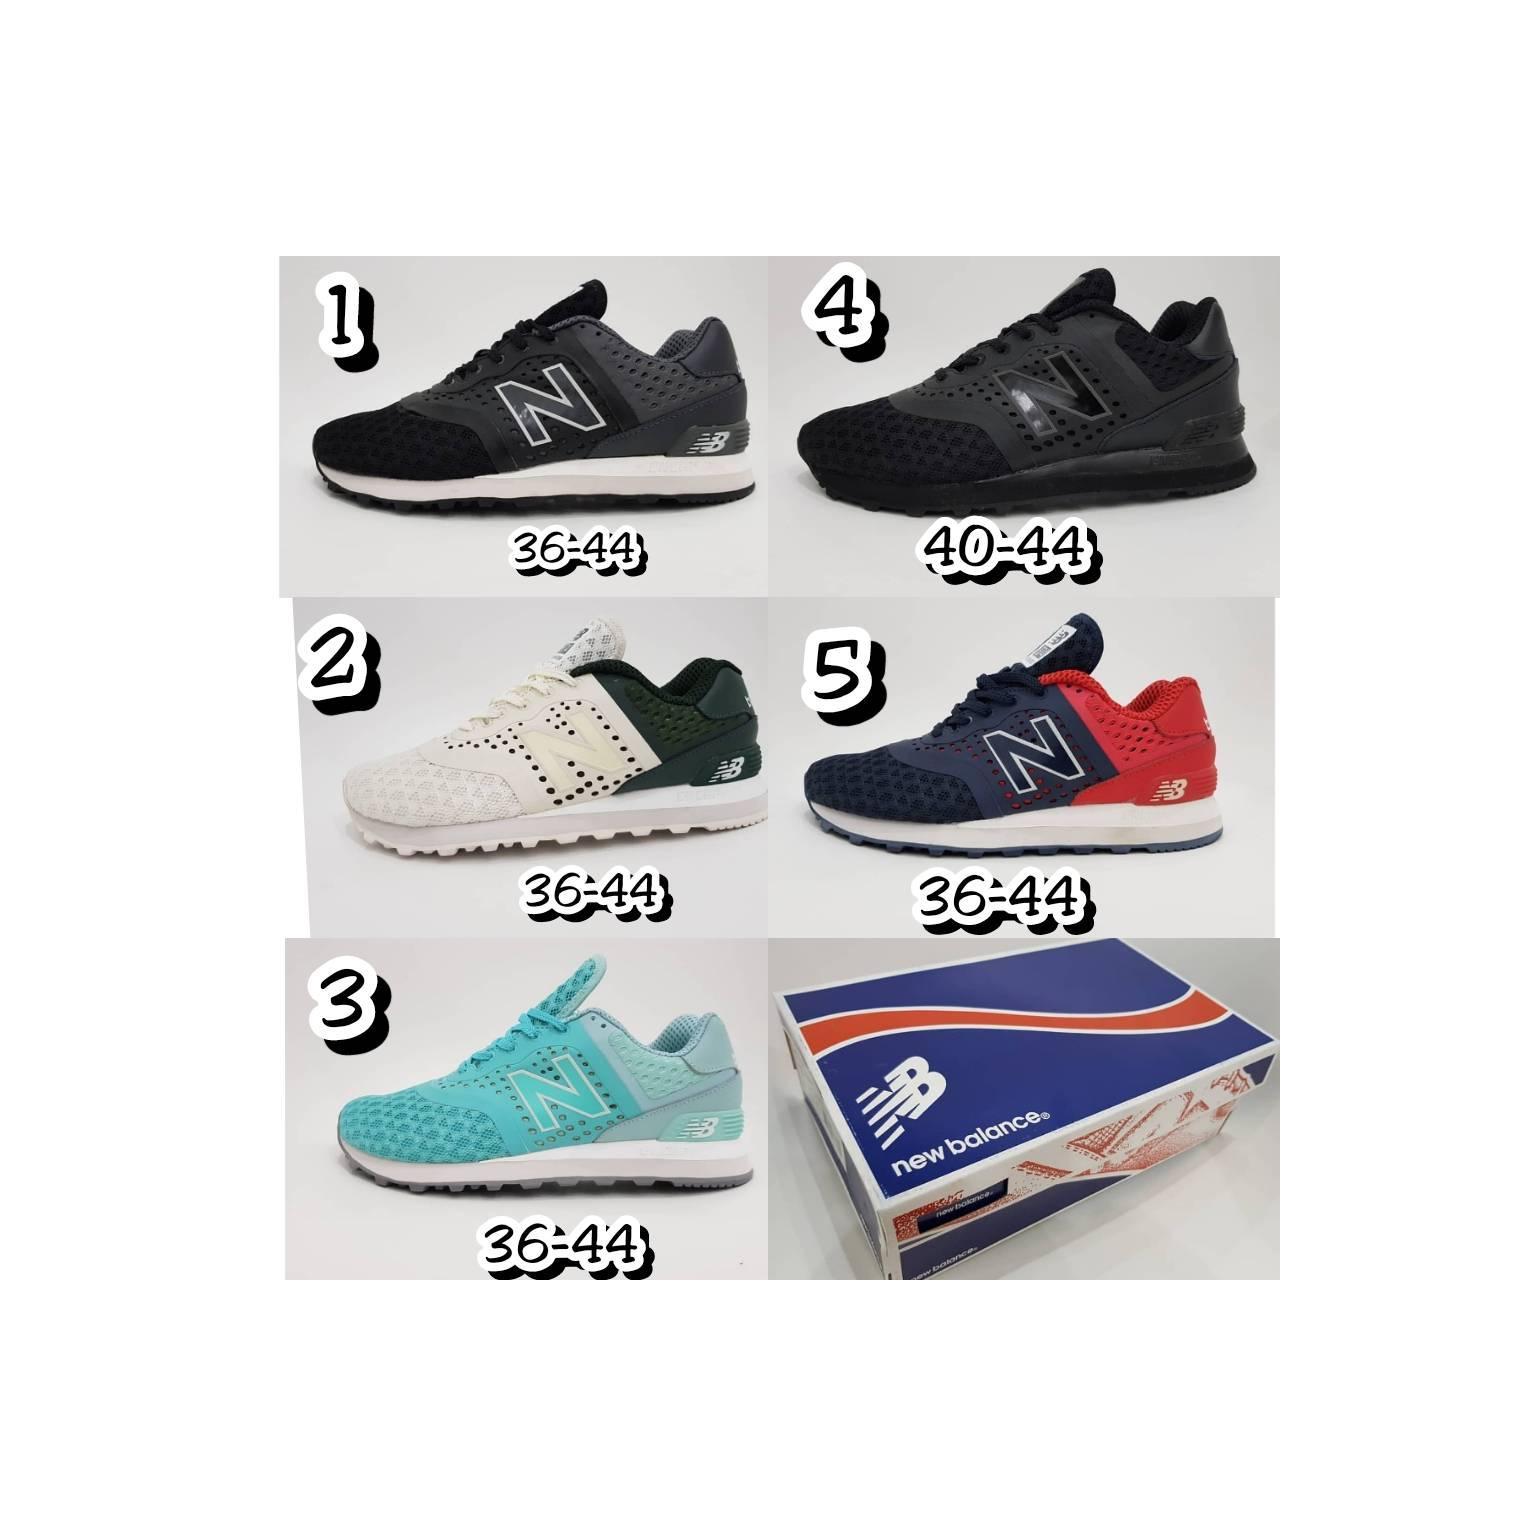 Sepatu Nb New Balance 574 Pria Laki Cowok Casual Santai 565 Sneakers Hitam Pantai Musim Panas Zs918 Parks